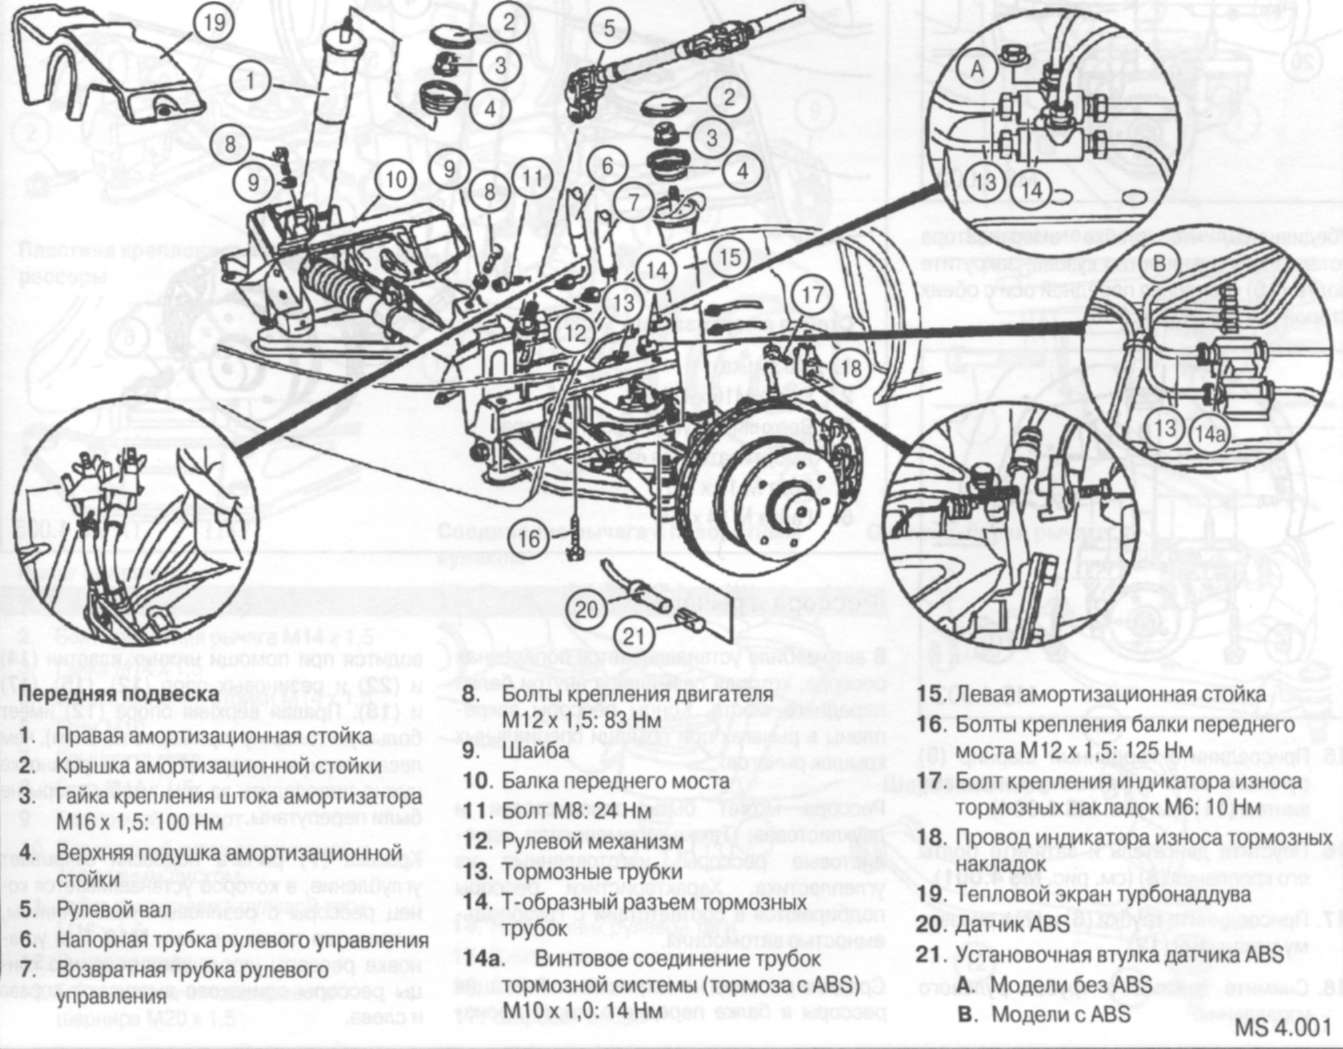 6.2.1 Подвеска передних колес